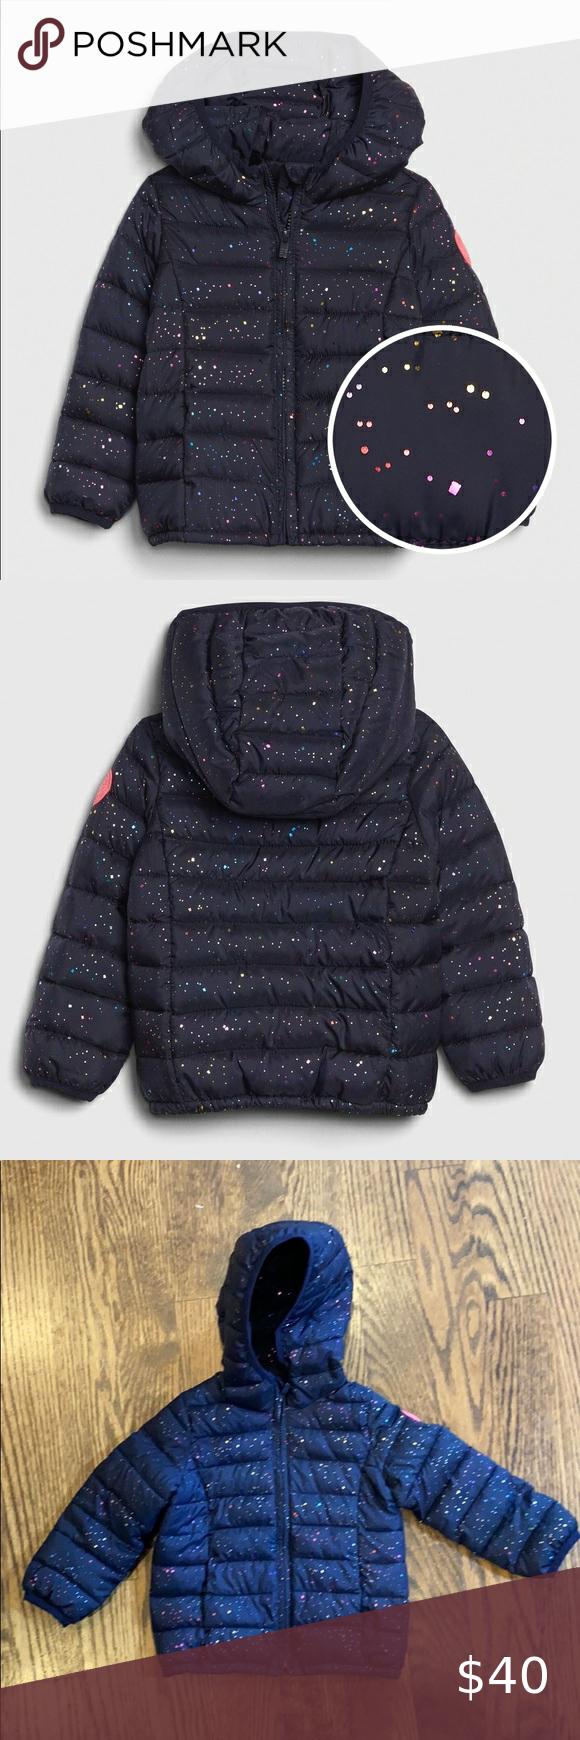 Gap Kids Toddler Cold Control Puffer 3t Navy Blue Girls Puffer Coat Toddler Winter Coat Pink Puffer Coat [ 1740 x 580 Pixel ]